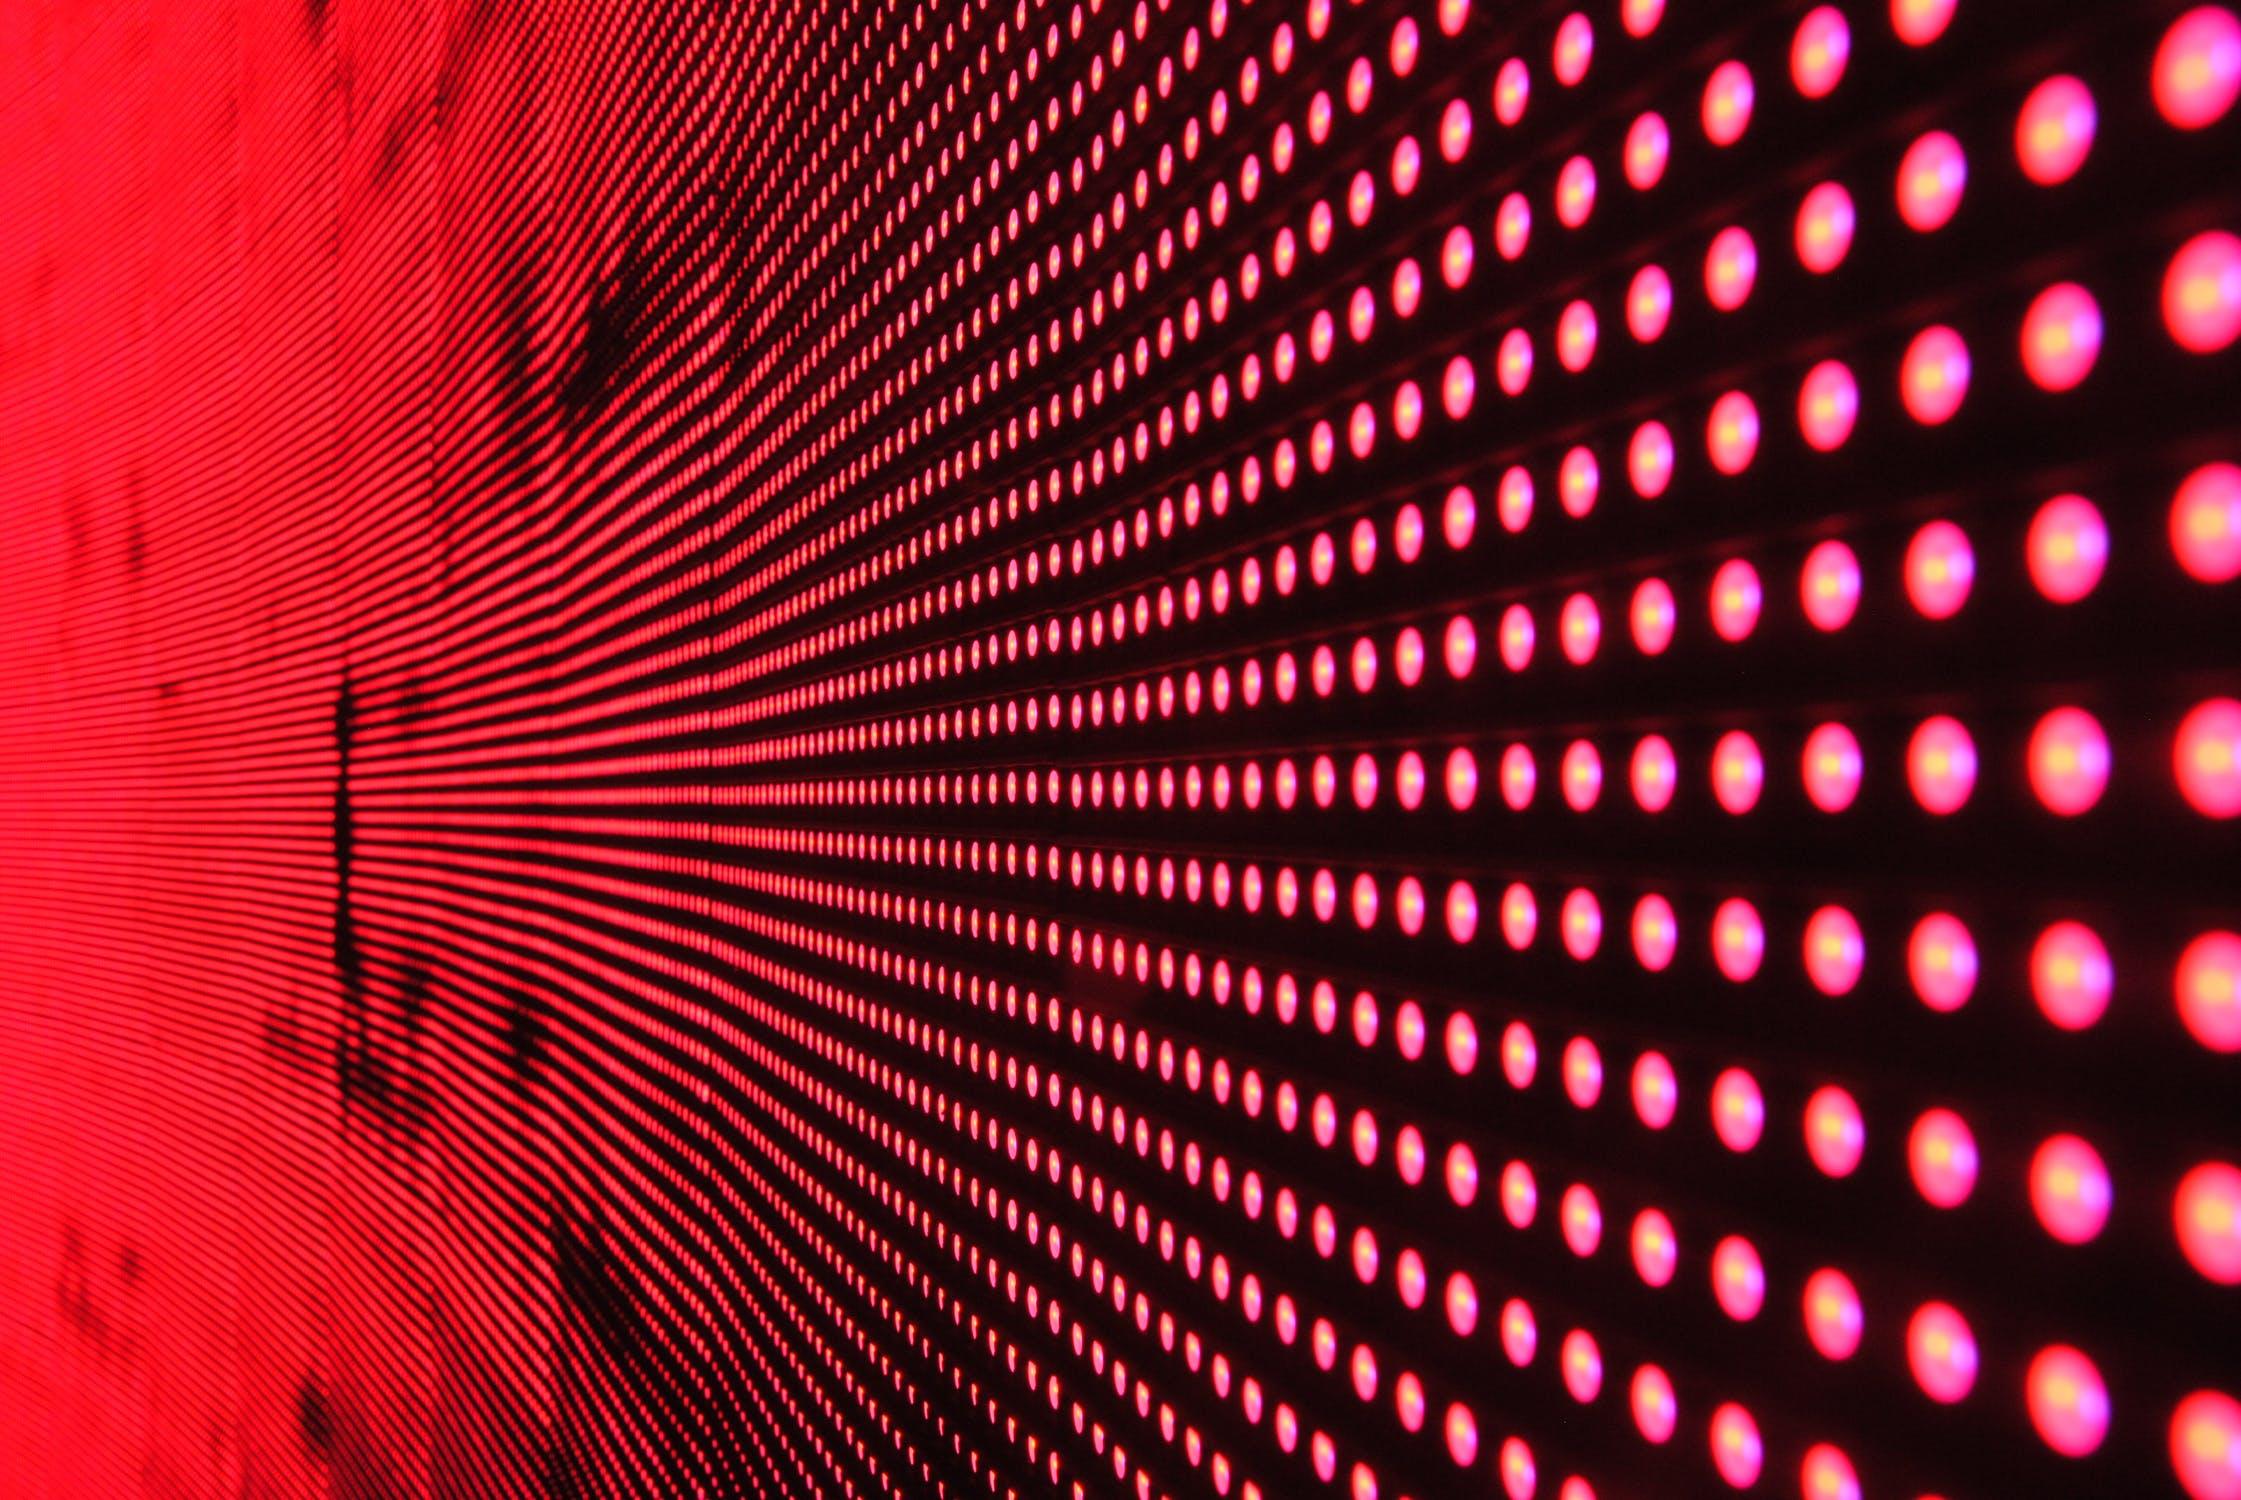 structure-light-led-movement-158826